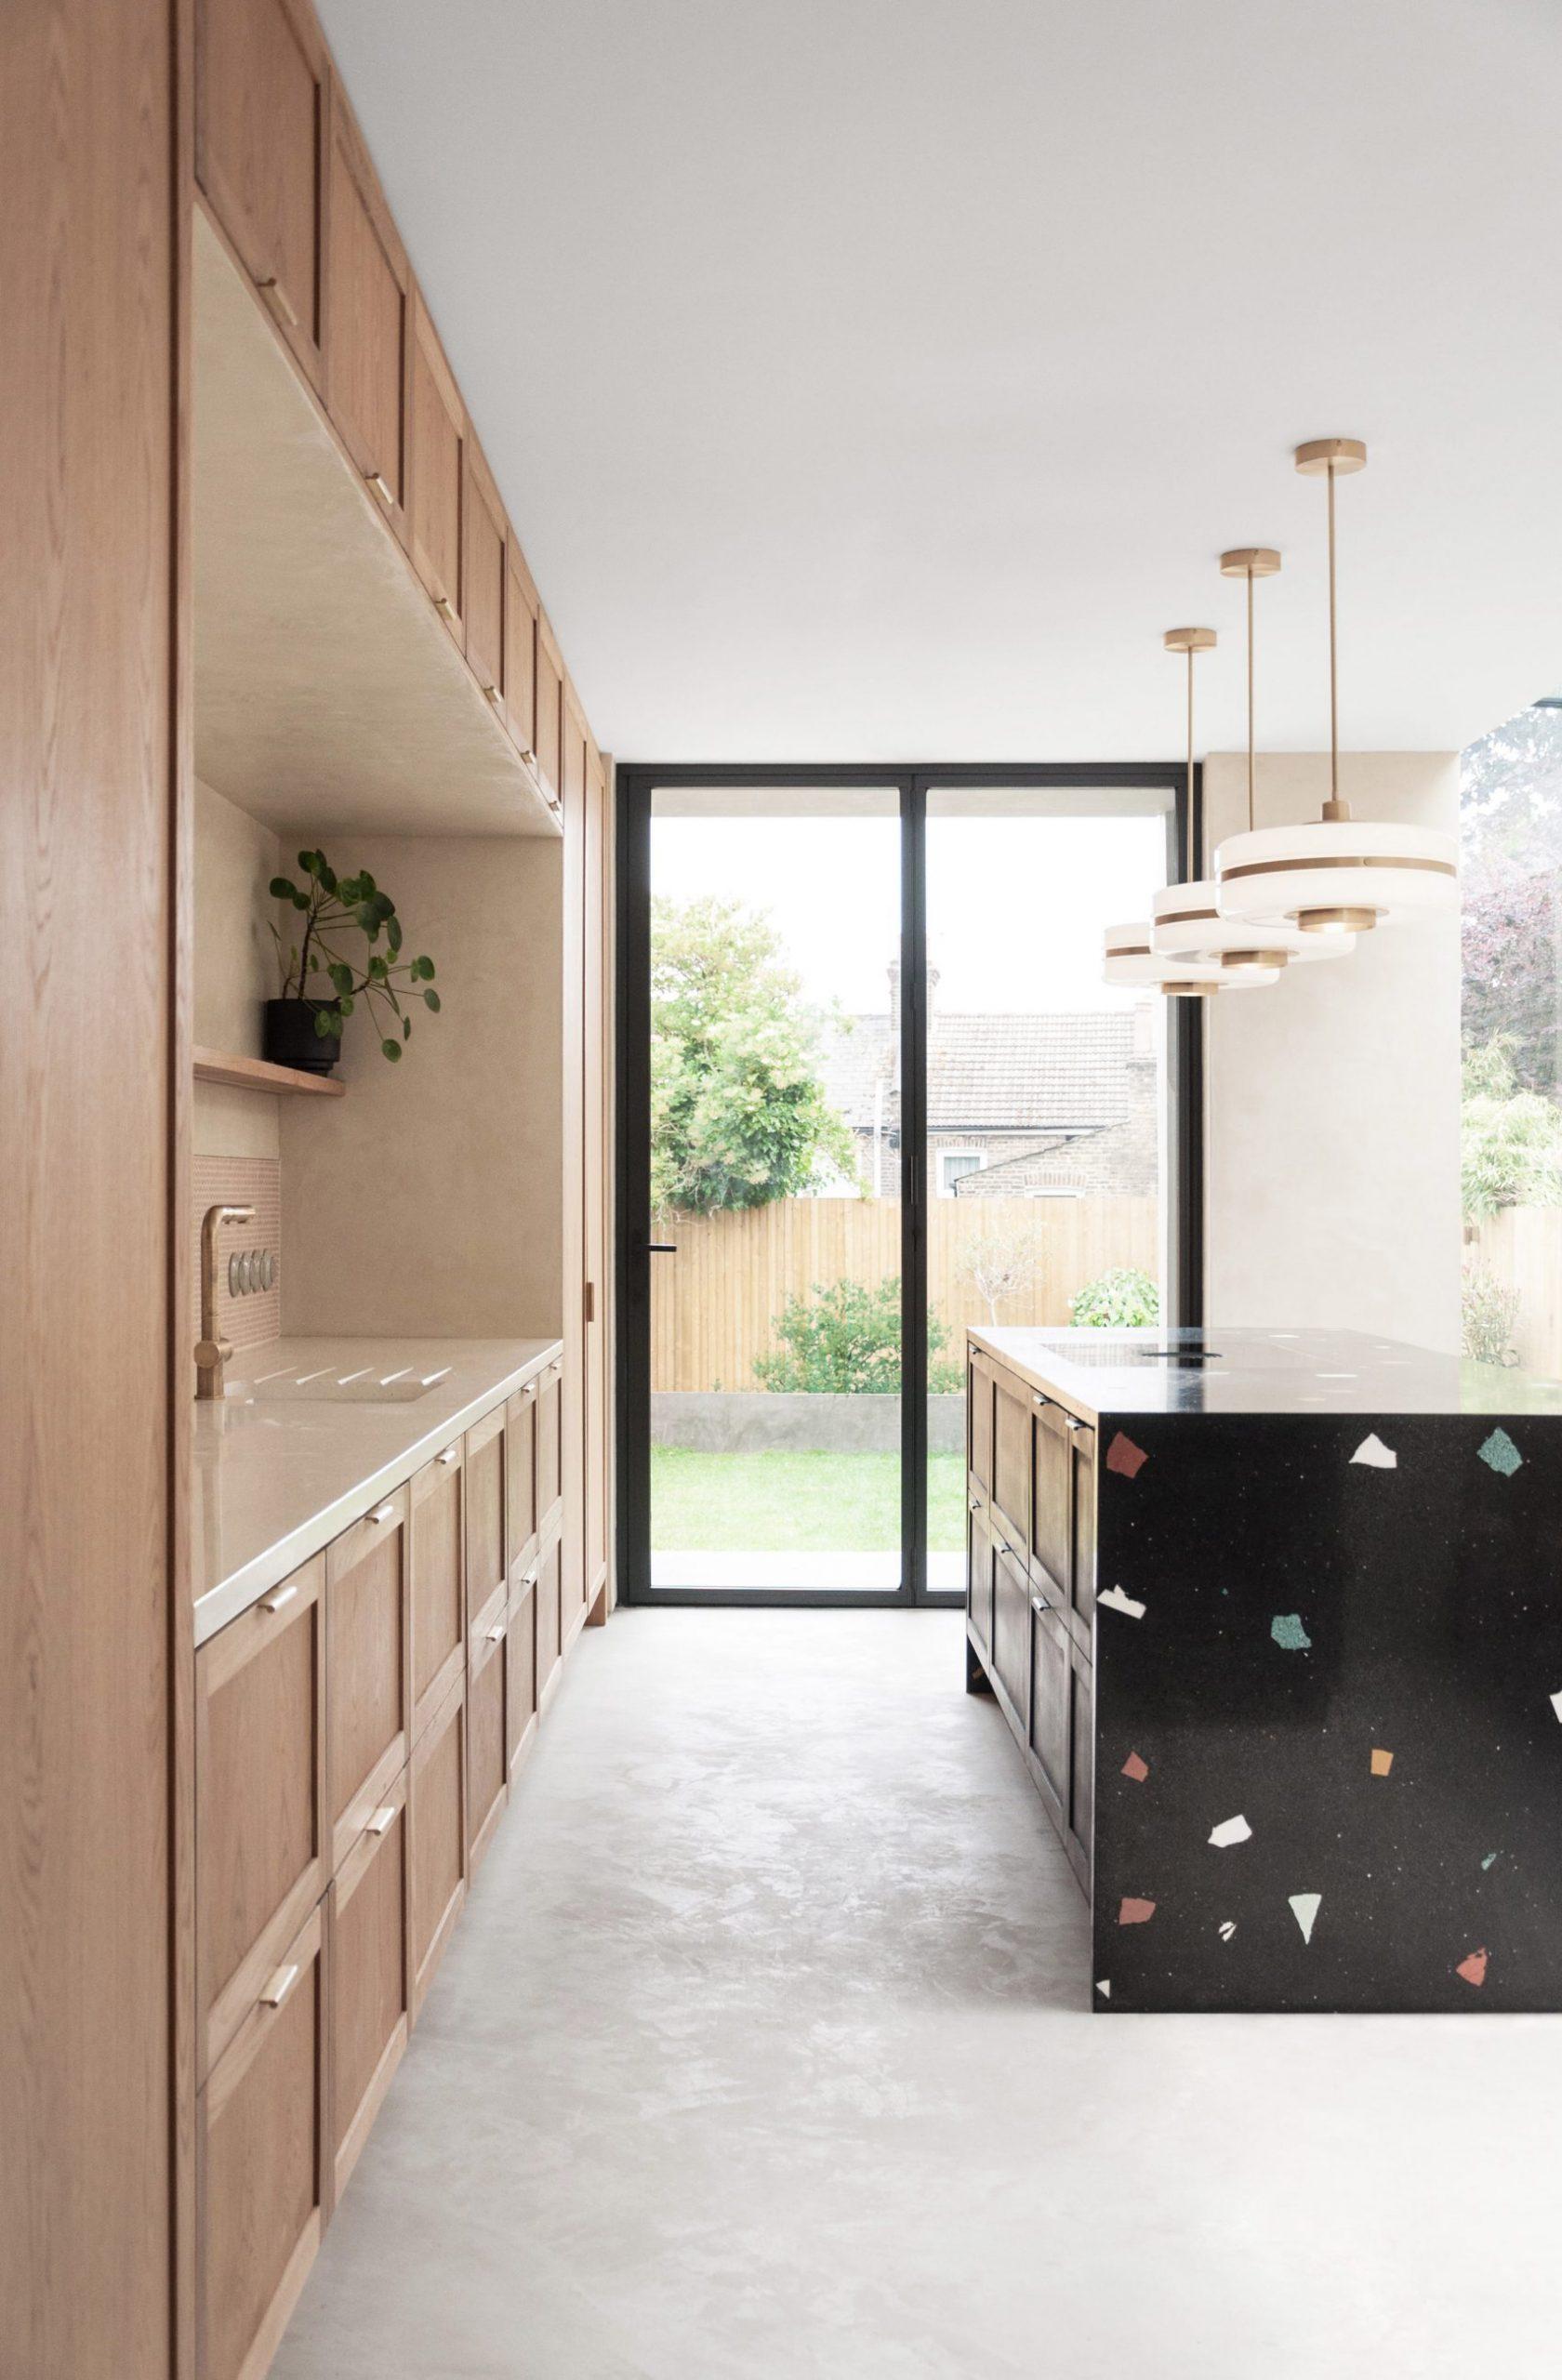 Black kitchen island with oversized terrazzo